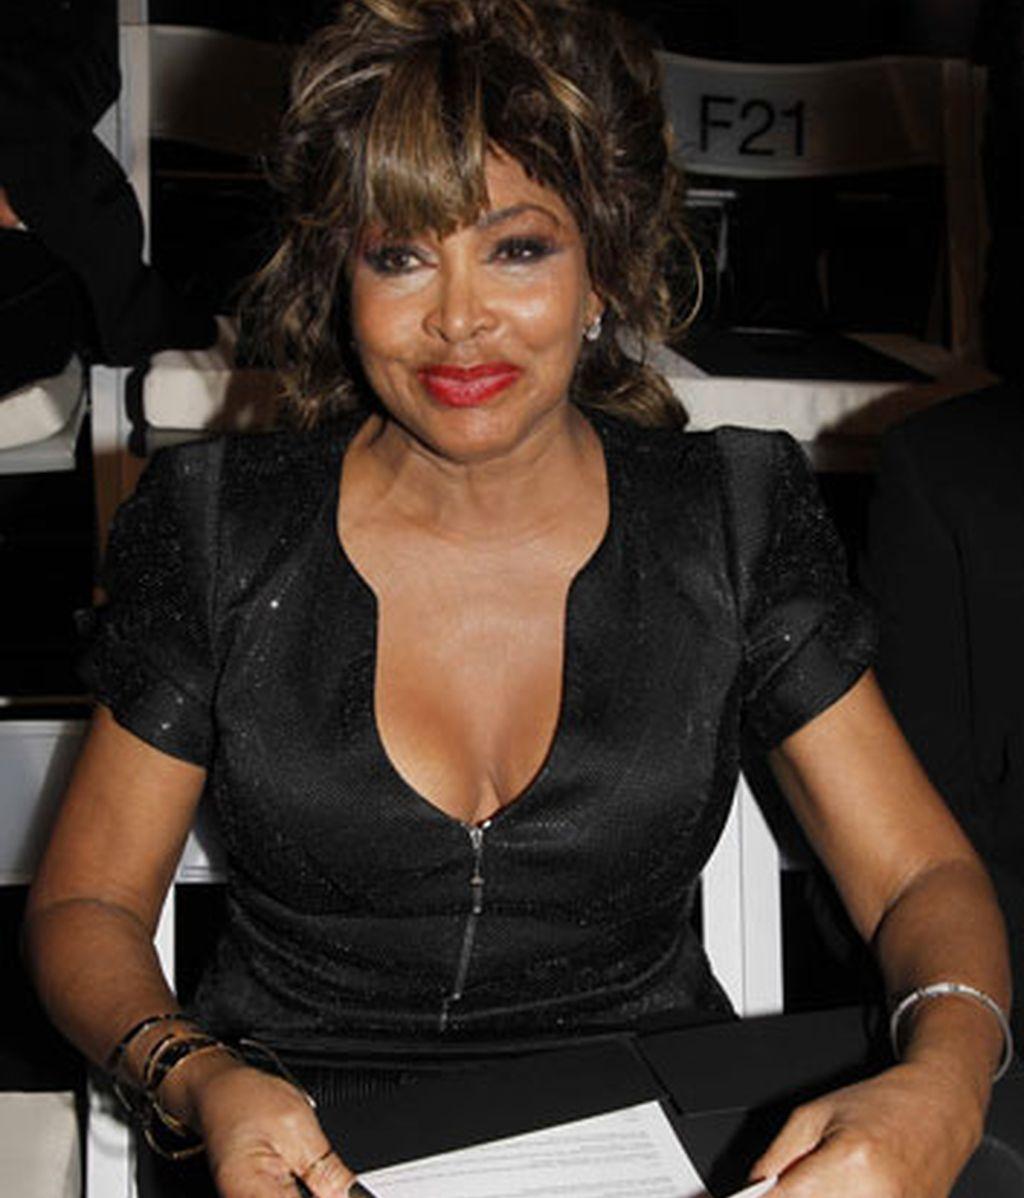 Tina Turner = Anna Mae Bullock